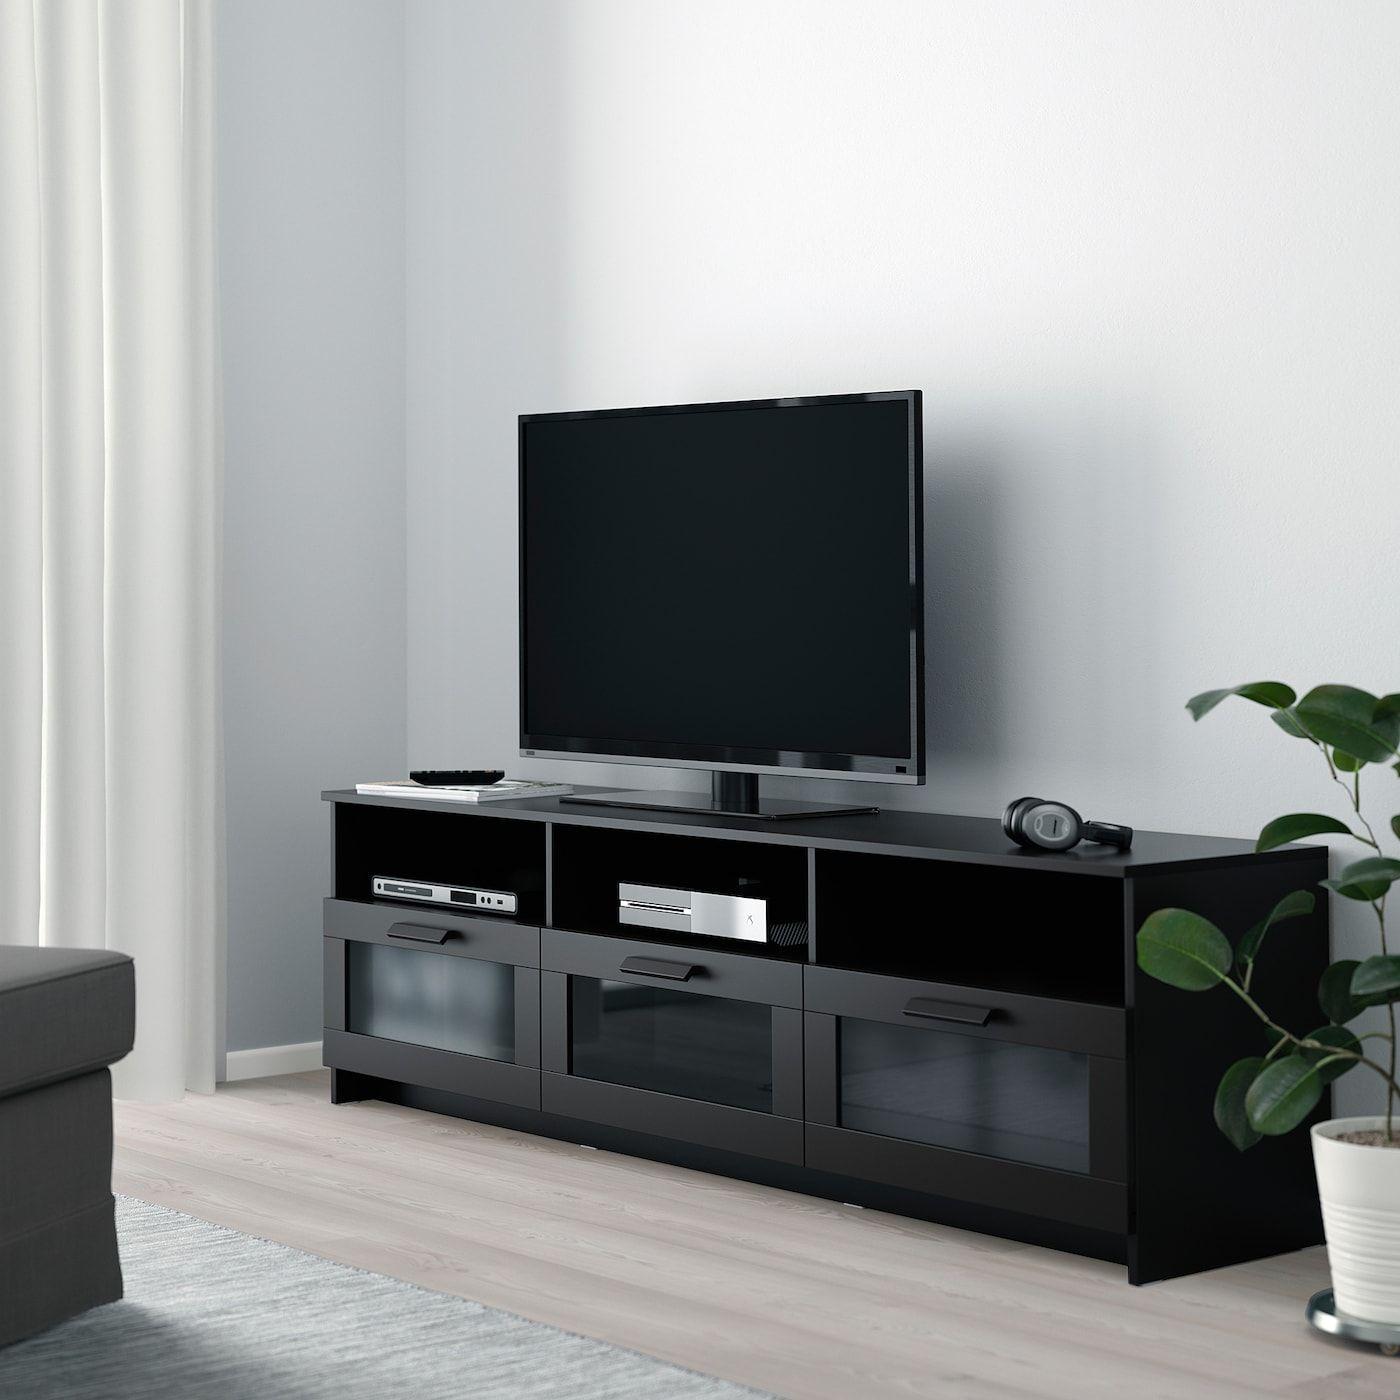 Brimnes Tv Bank Schwarz 180x41x53 Cm Ikea österreich Black Living Room Ikea Entertainment Units Black Living Room Decor